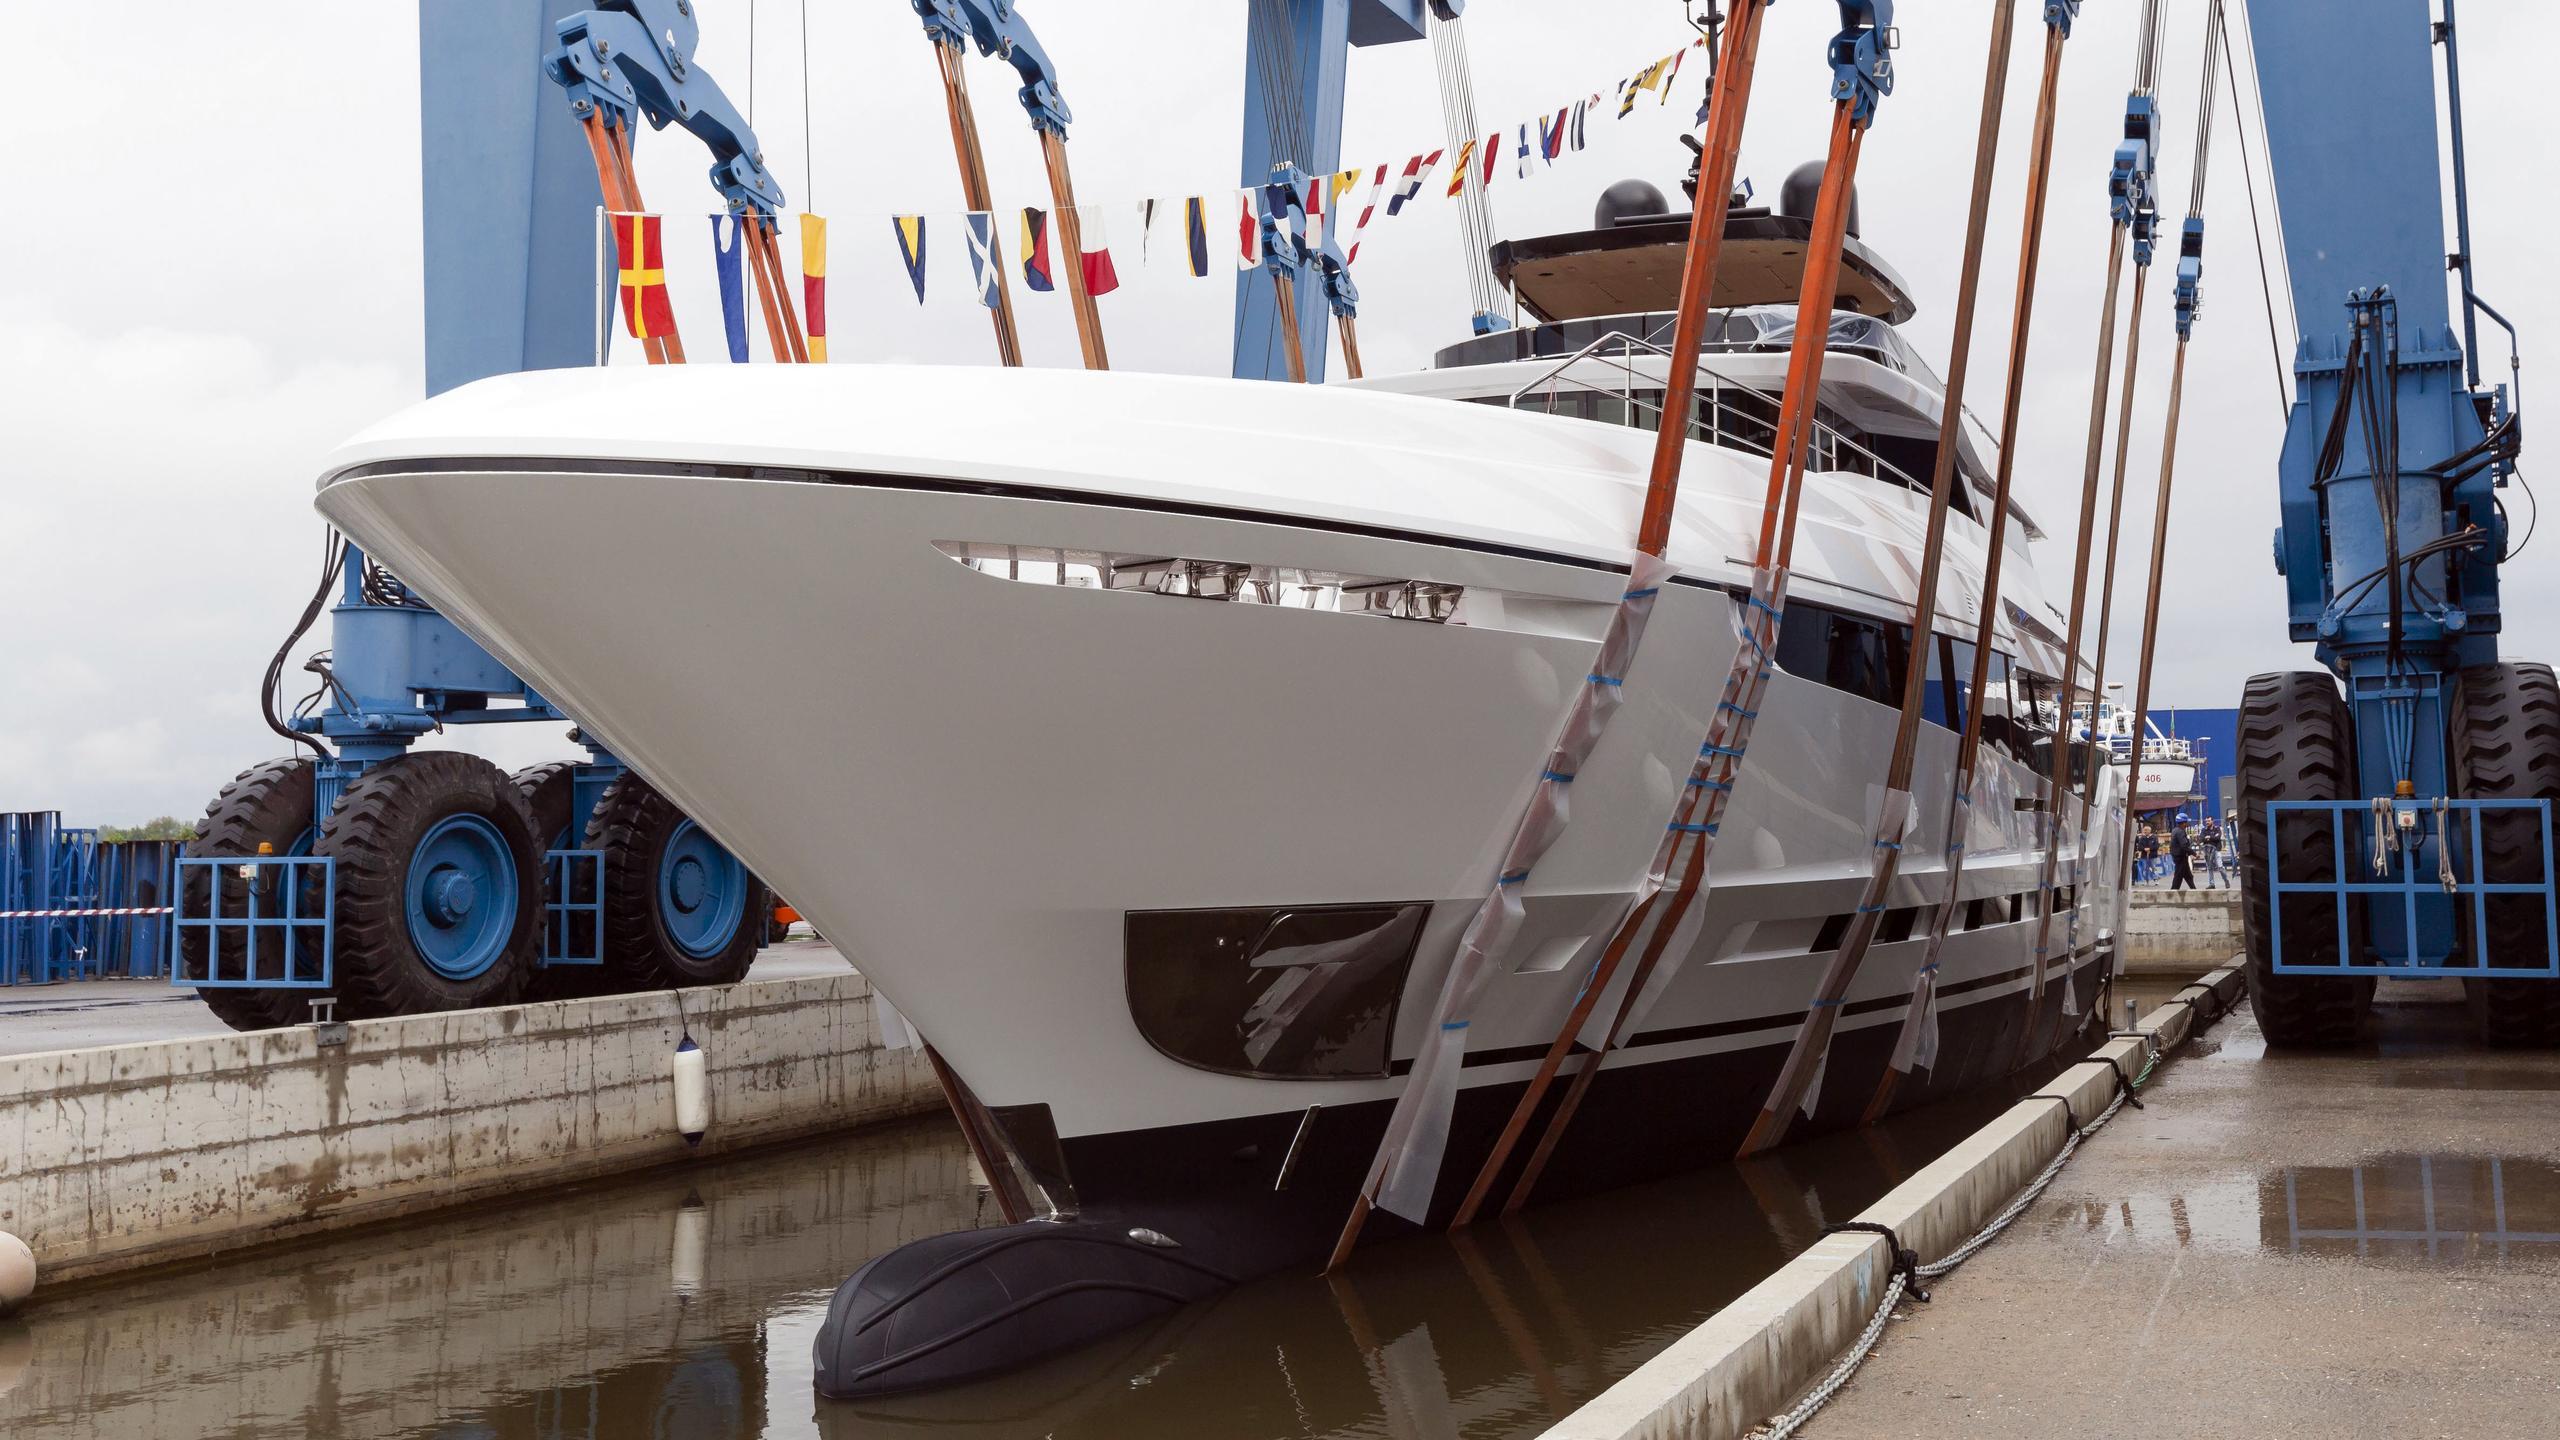 namaste motoryacht overmarine oceano 42 2016 43m launch half profile